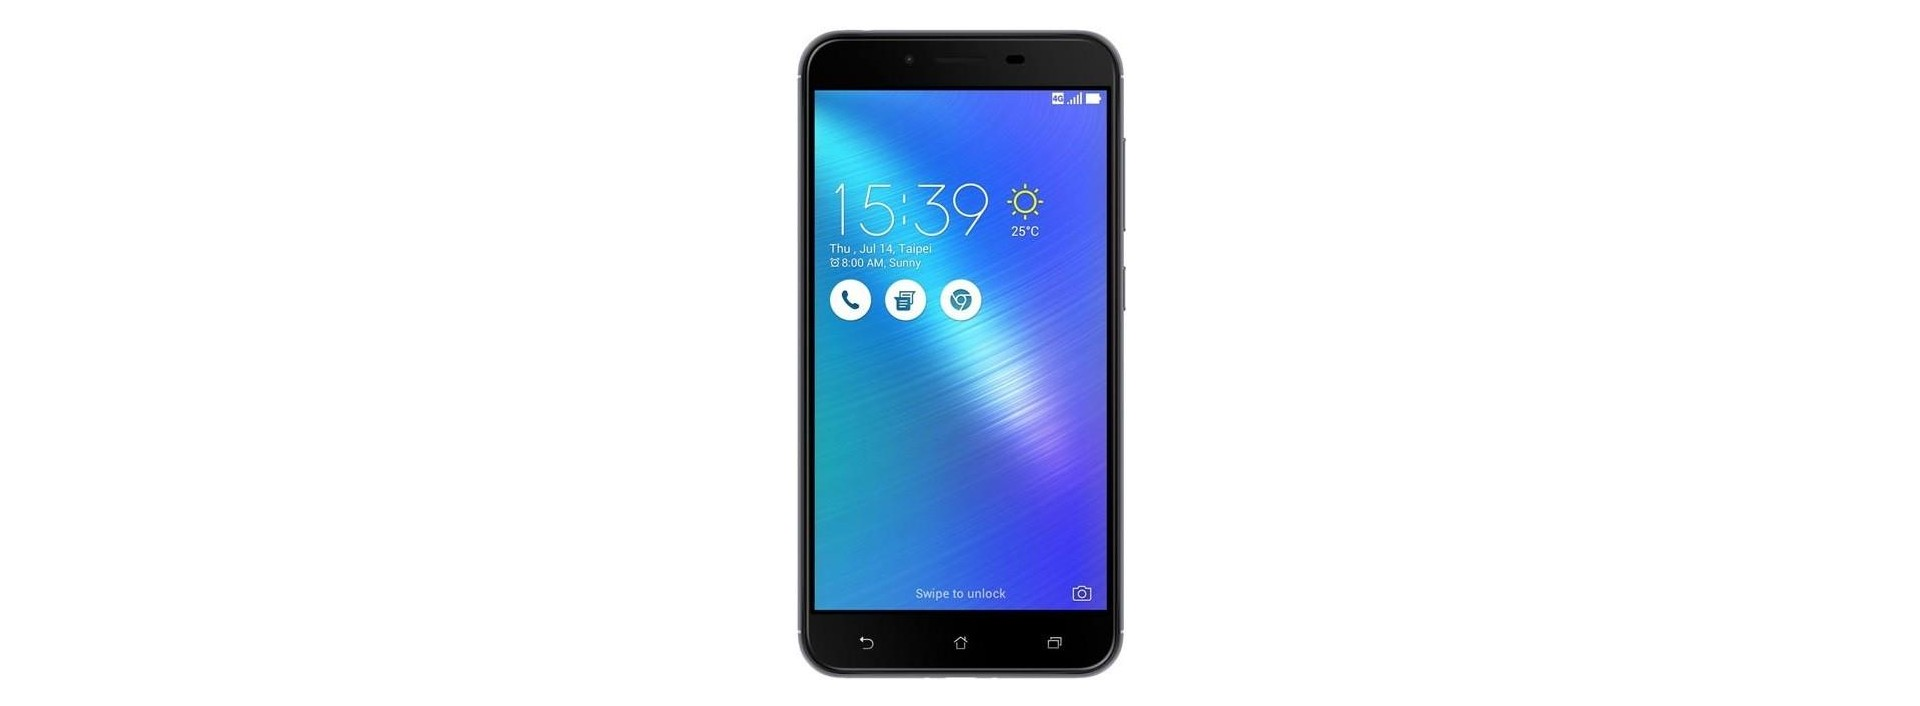 "Fundas PERSONALIZADAS Asus Zenfone 3 Max 5.5"" ZC553KL, Envío Gratis TMS"